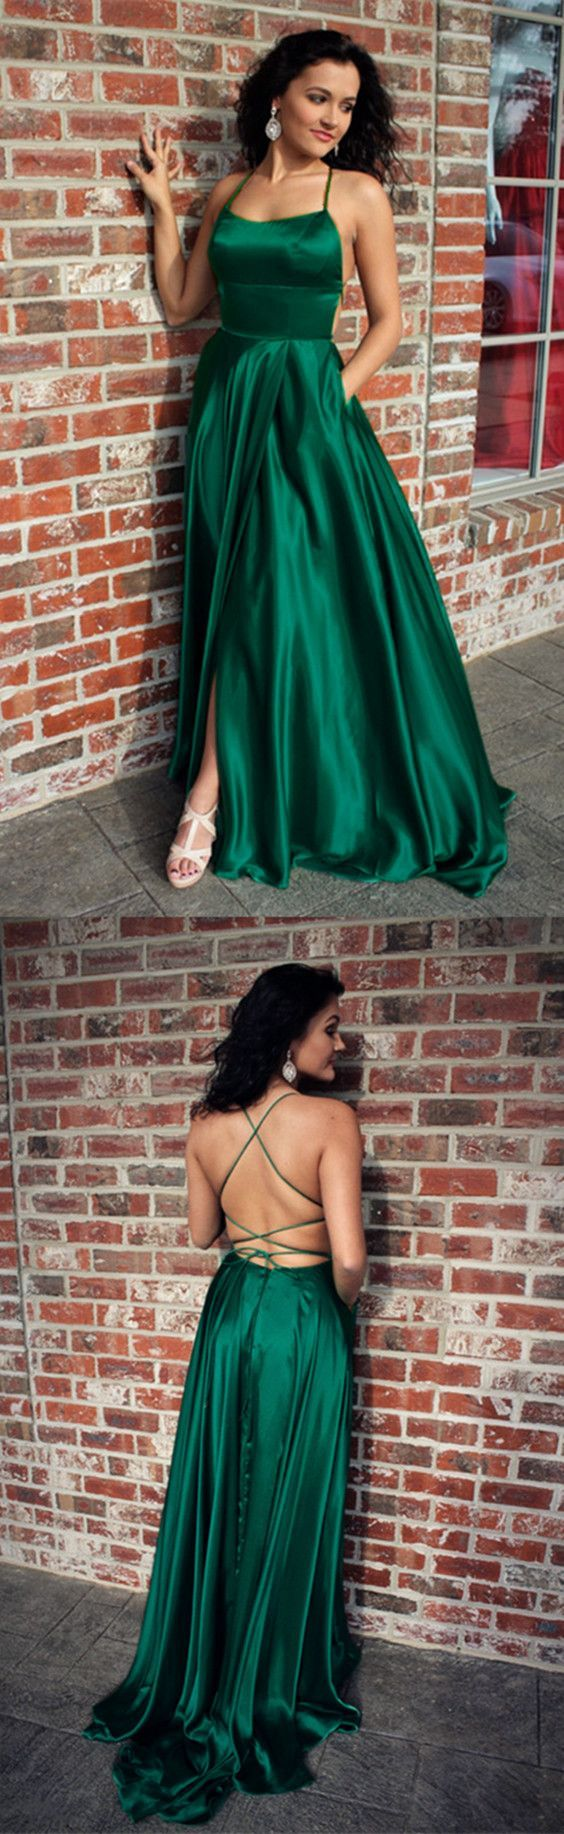 Long Green Satin Open Back Prom Dresses Leg Slit Evening Gowns